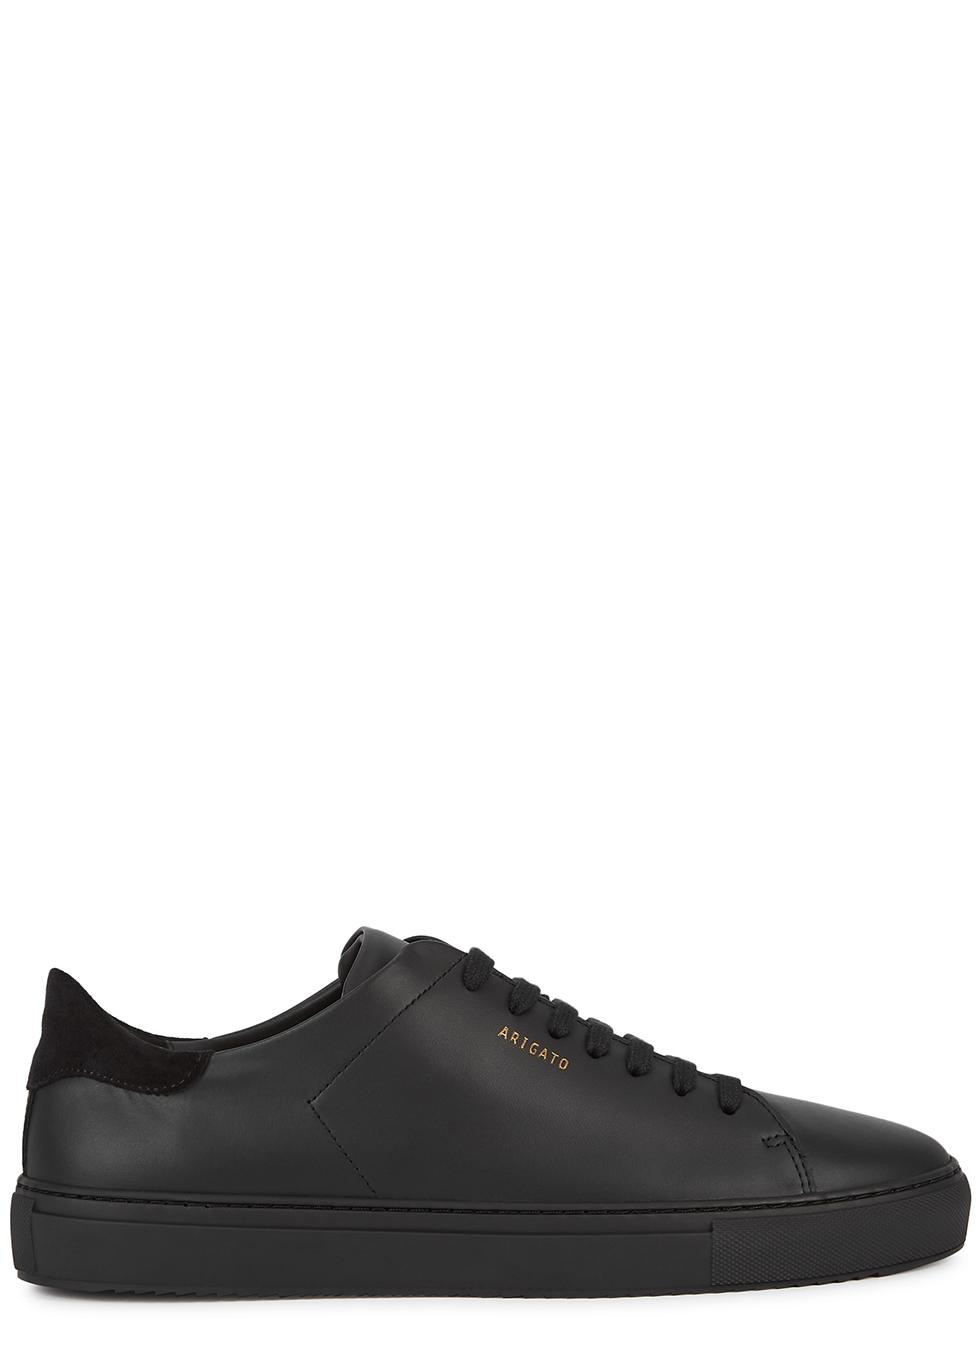 Clean 90 black leather sneakers